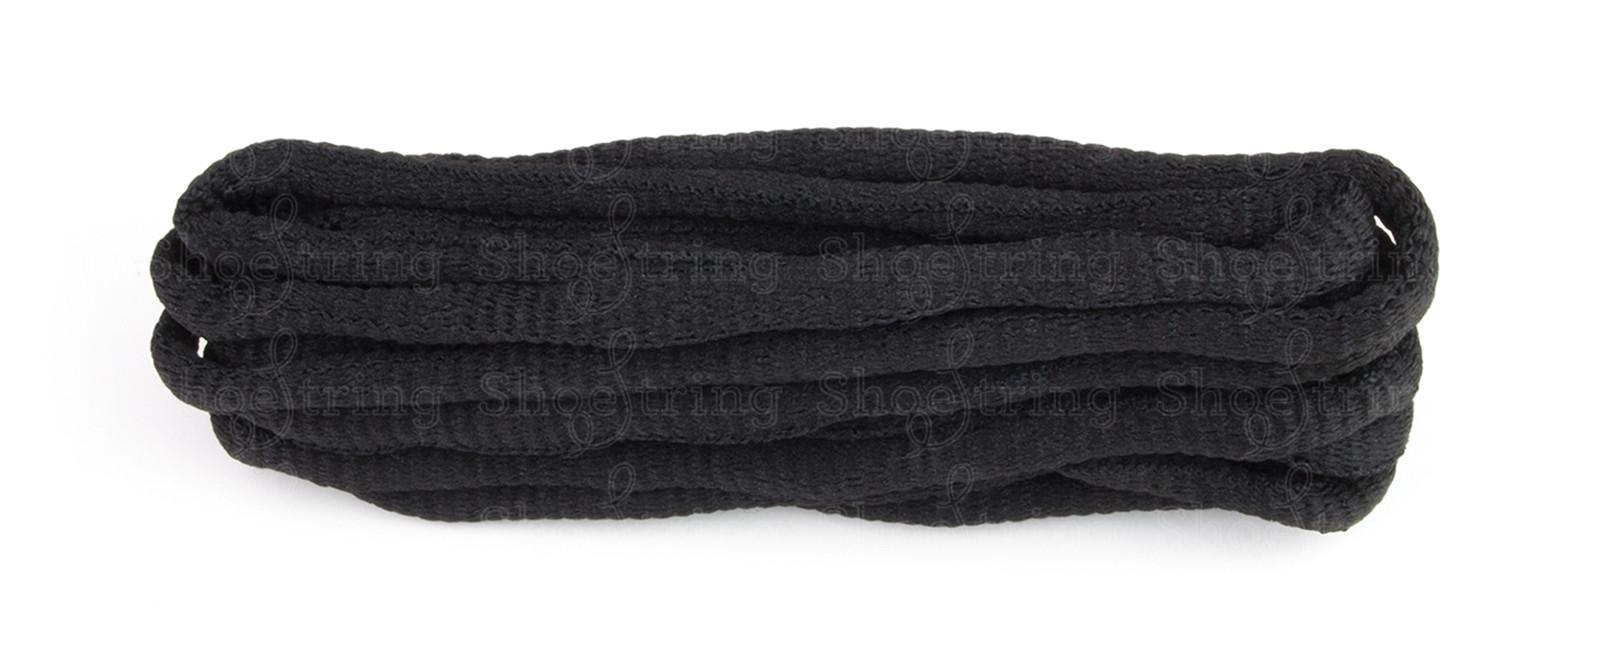 Black Knobbly Oval Firm Knot 114cm